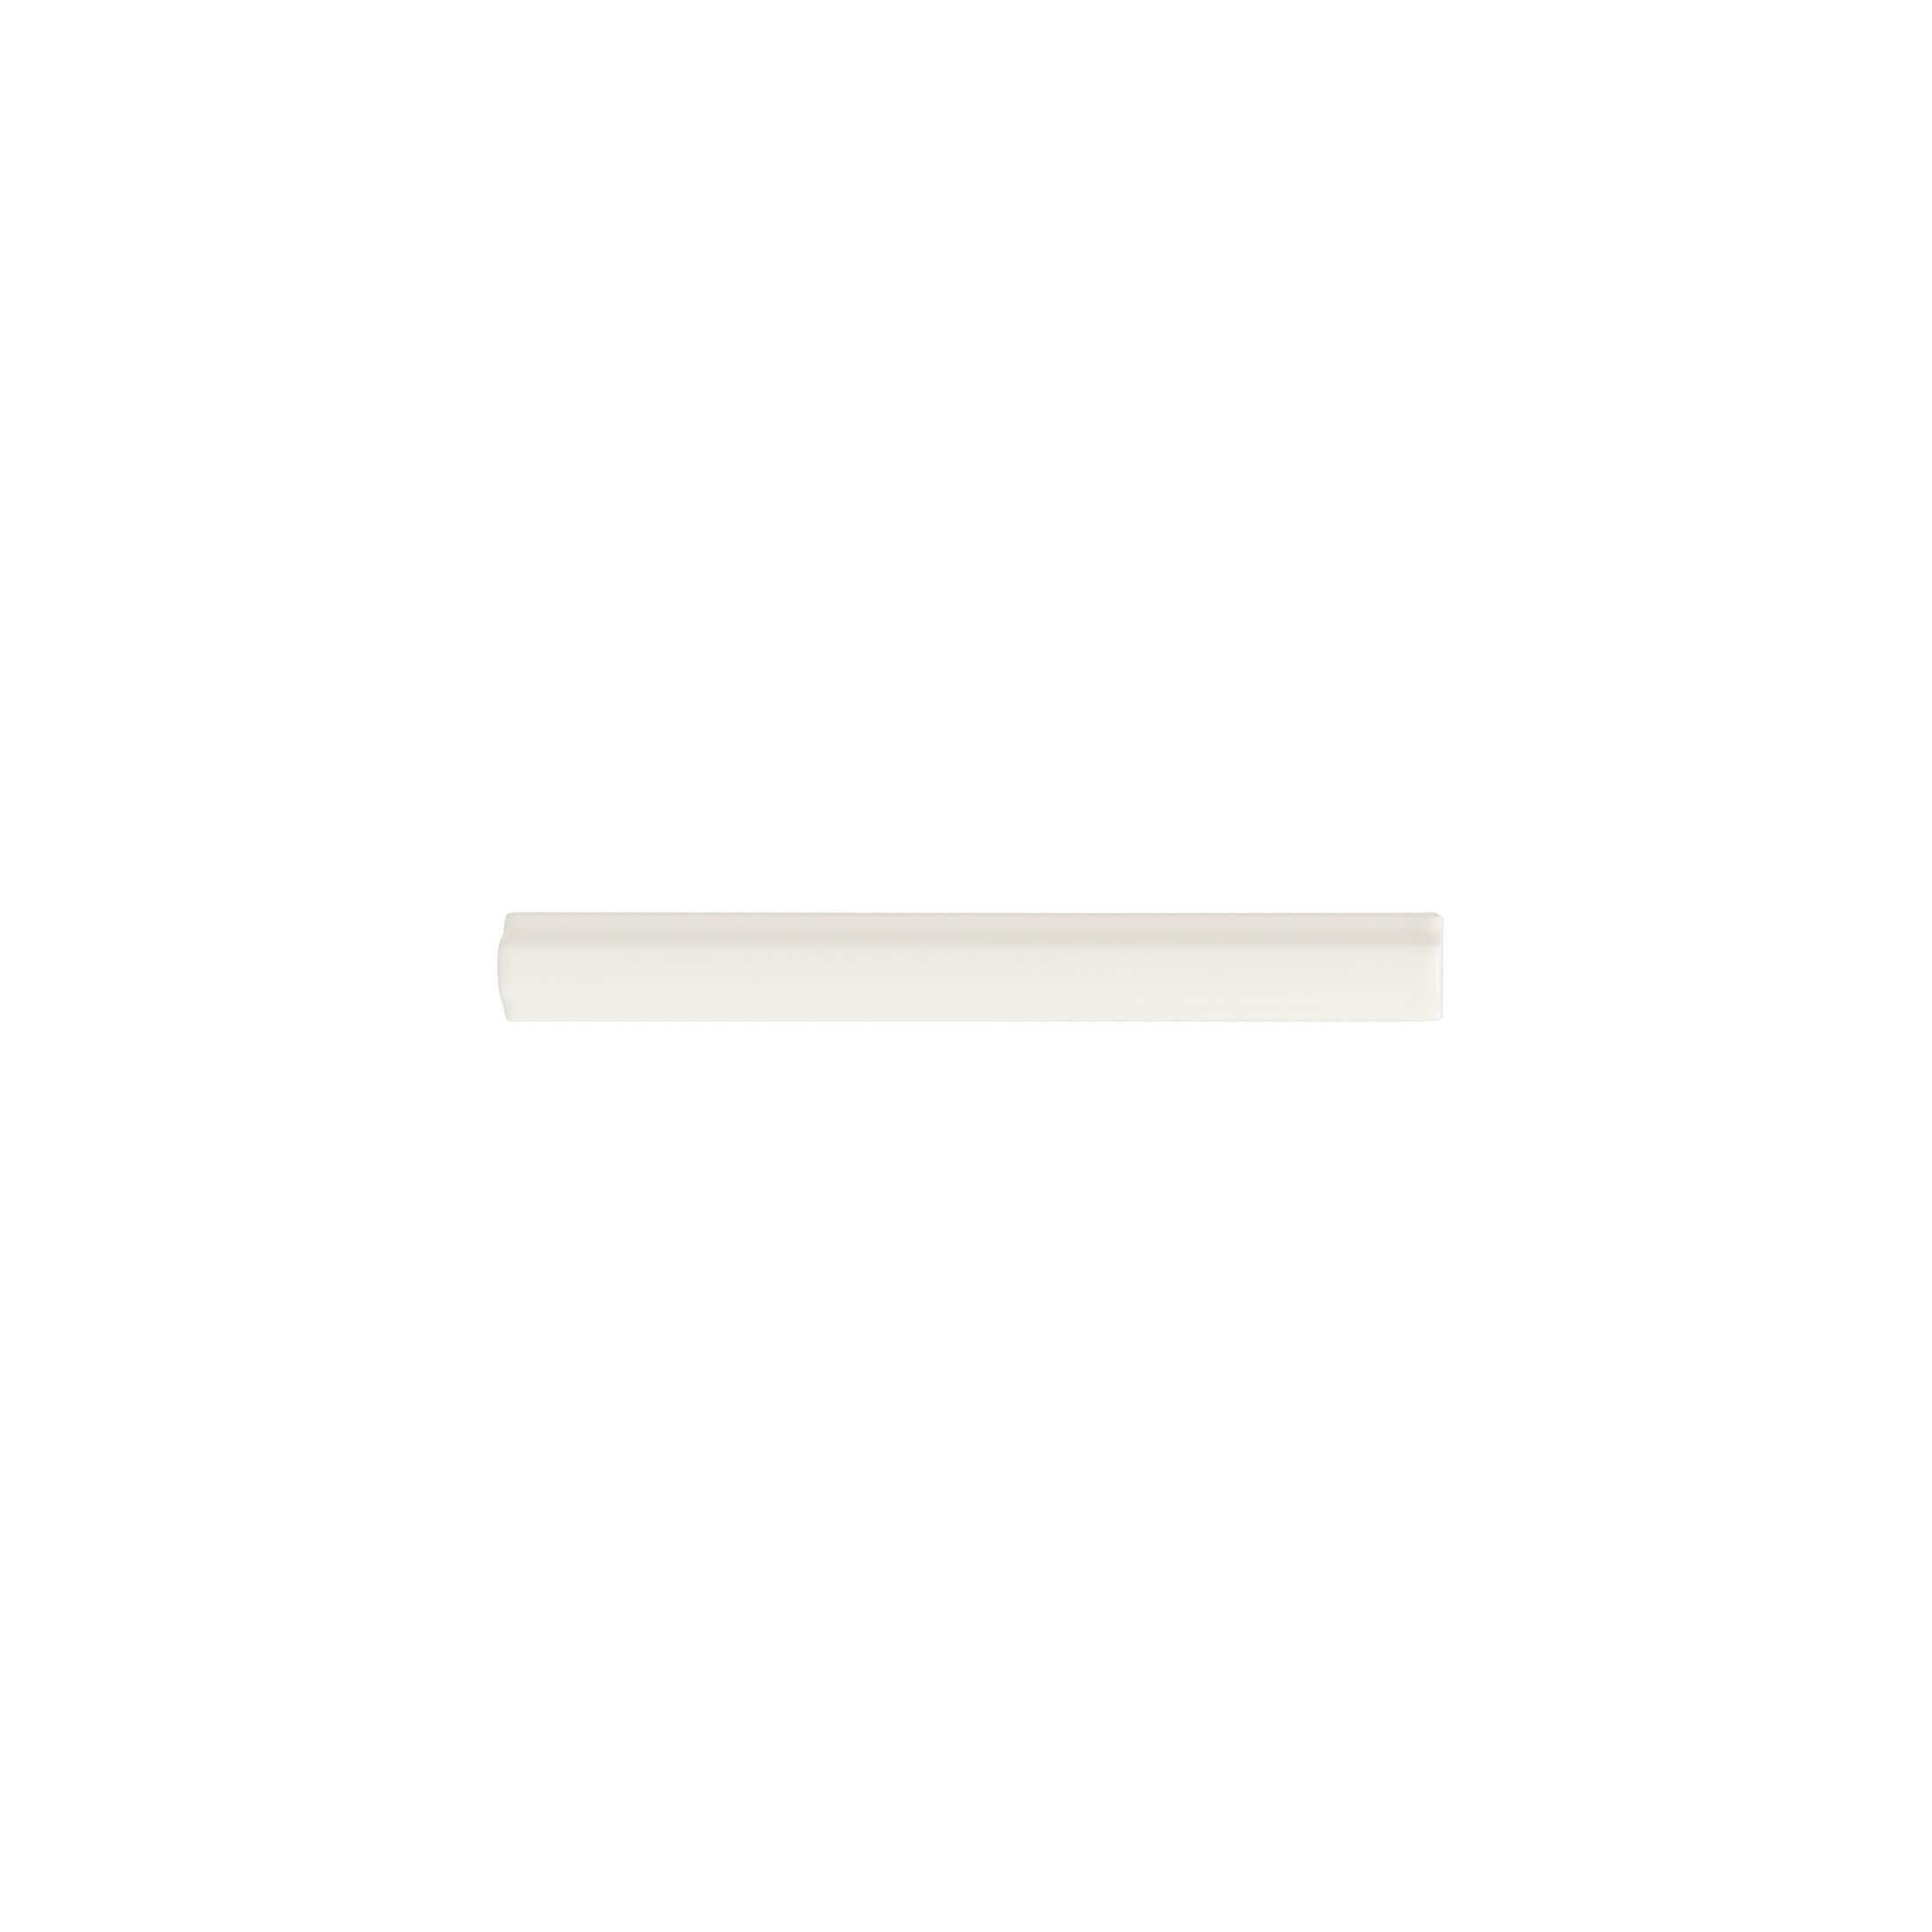 ADNE5355 - LISTELO CLASICO - 1.7 cm X 15 cm